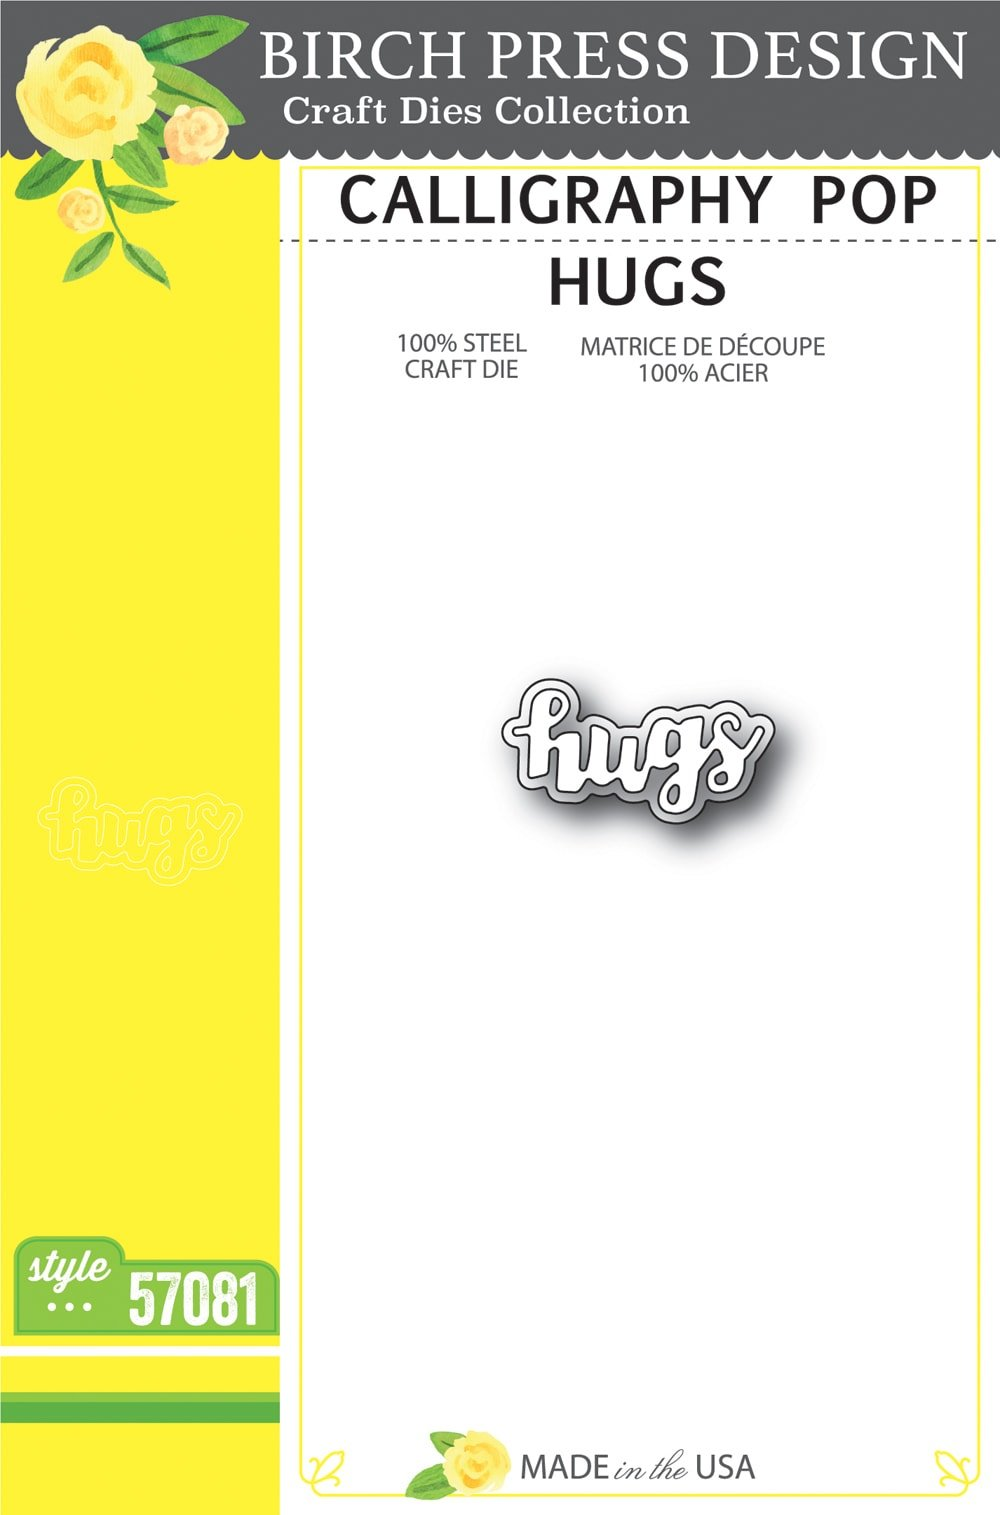 Birch Press Design - Calligraphy Pop Hugs Die